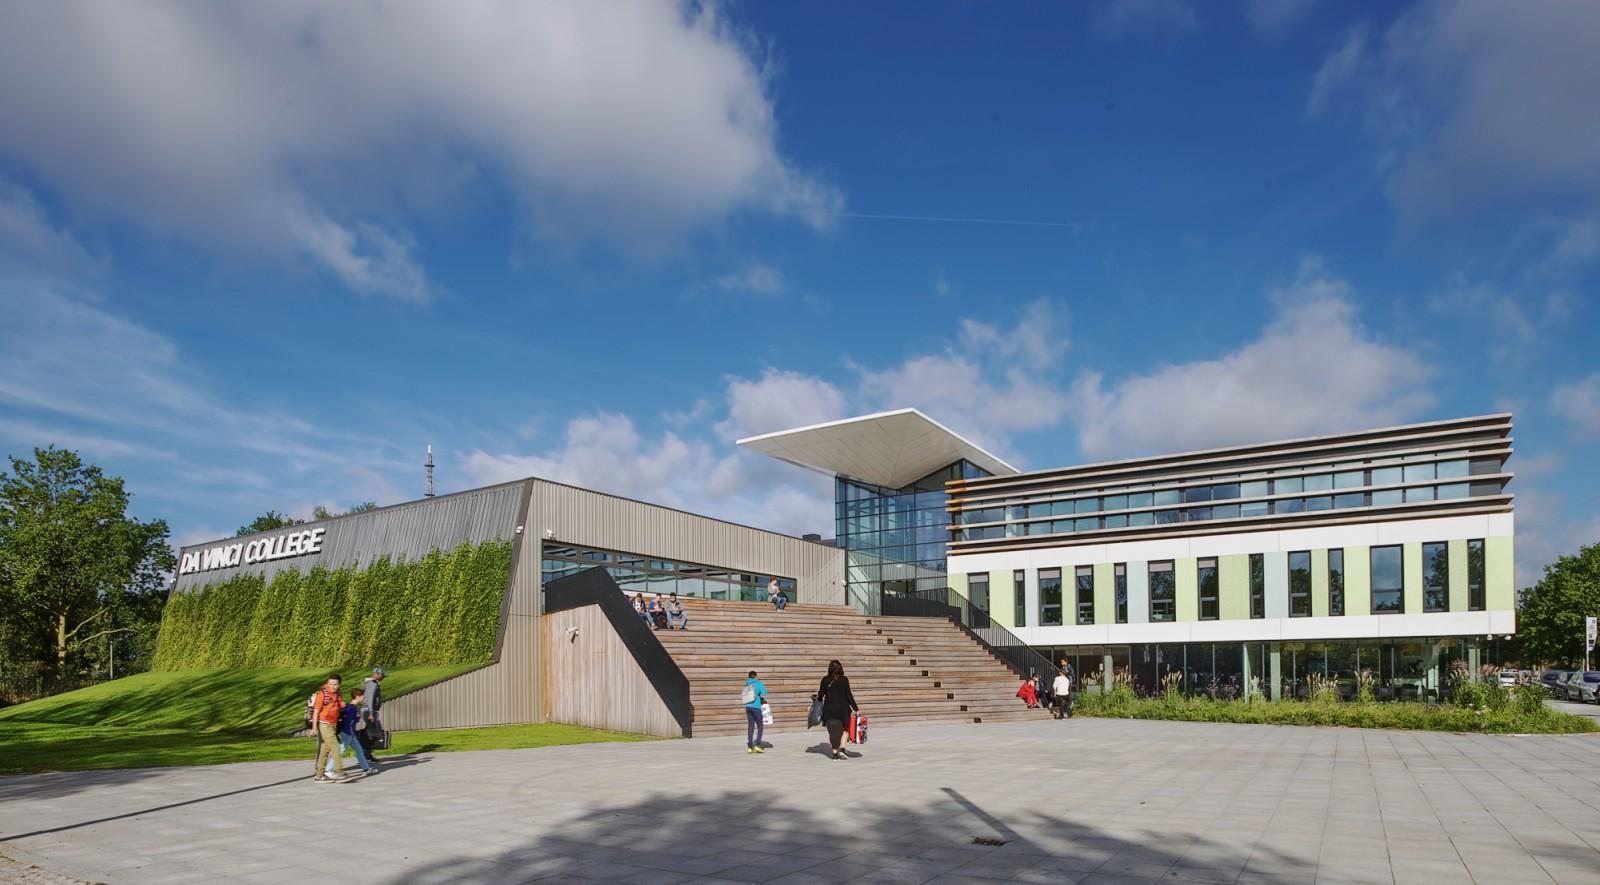 new Da Vinci College